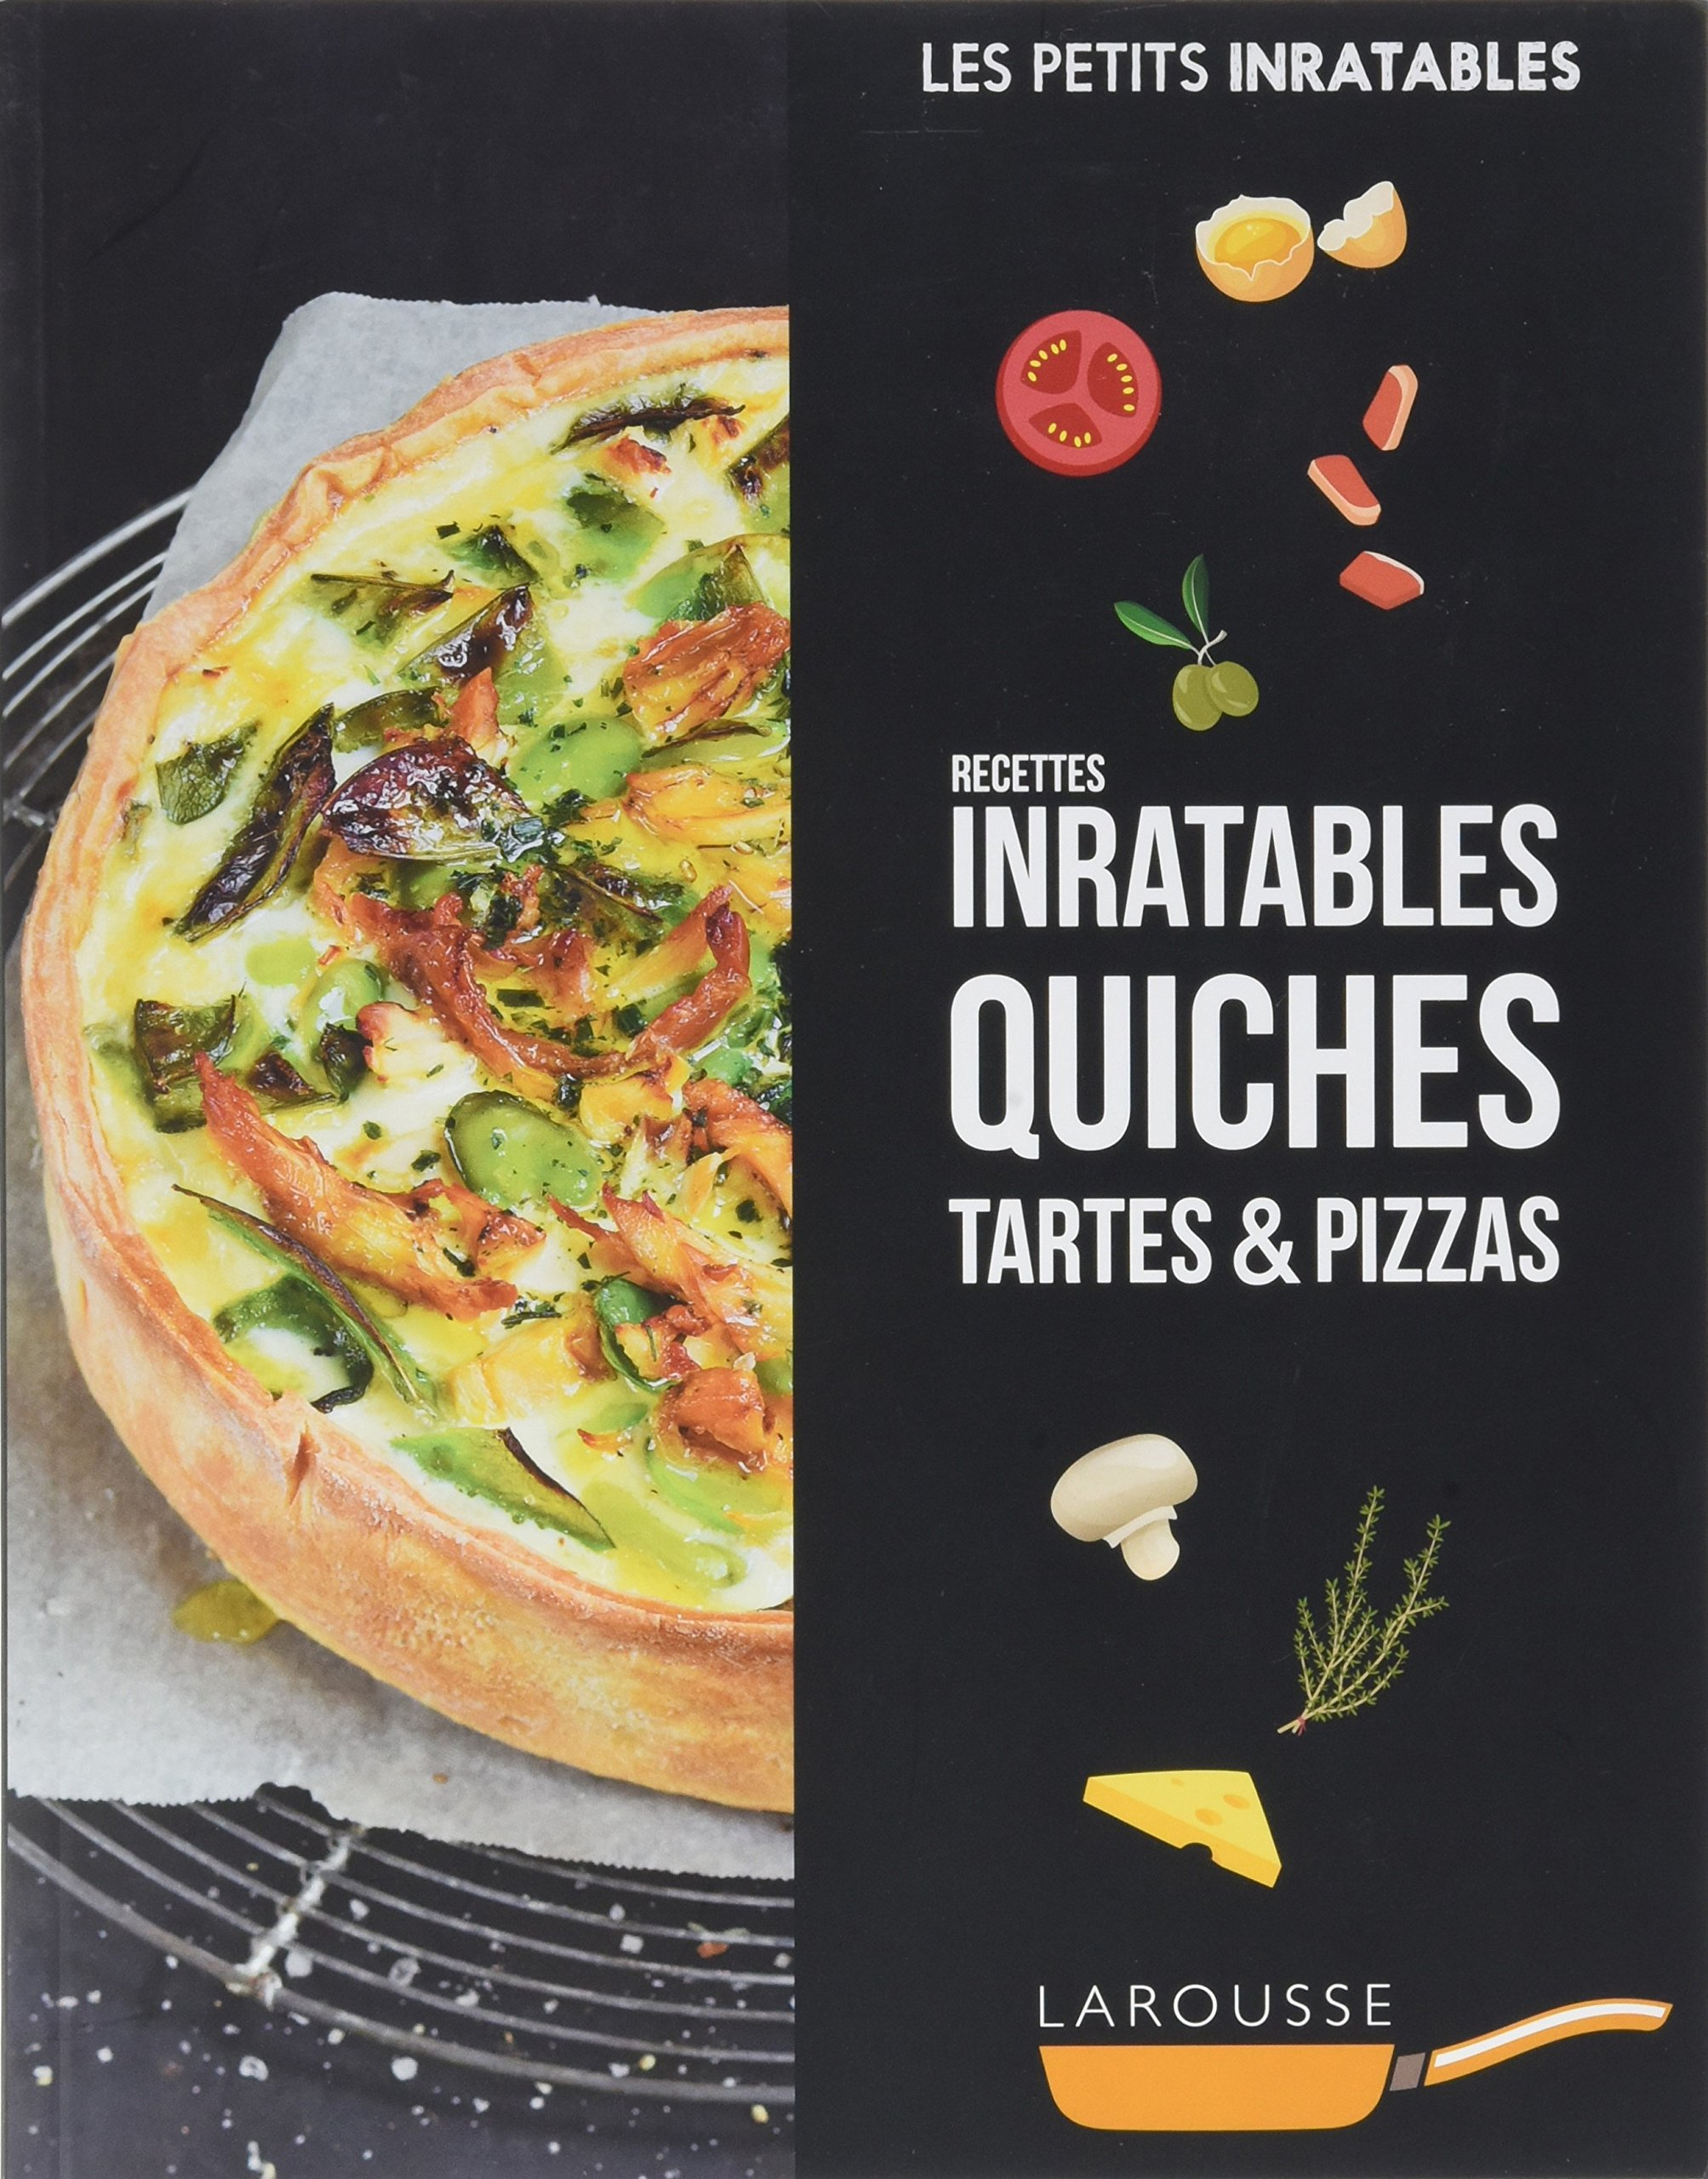 Amazon.fr - Recettes inratables quiches, tartes & pizzas - Collectif -  Livres